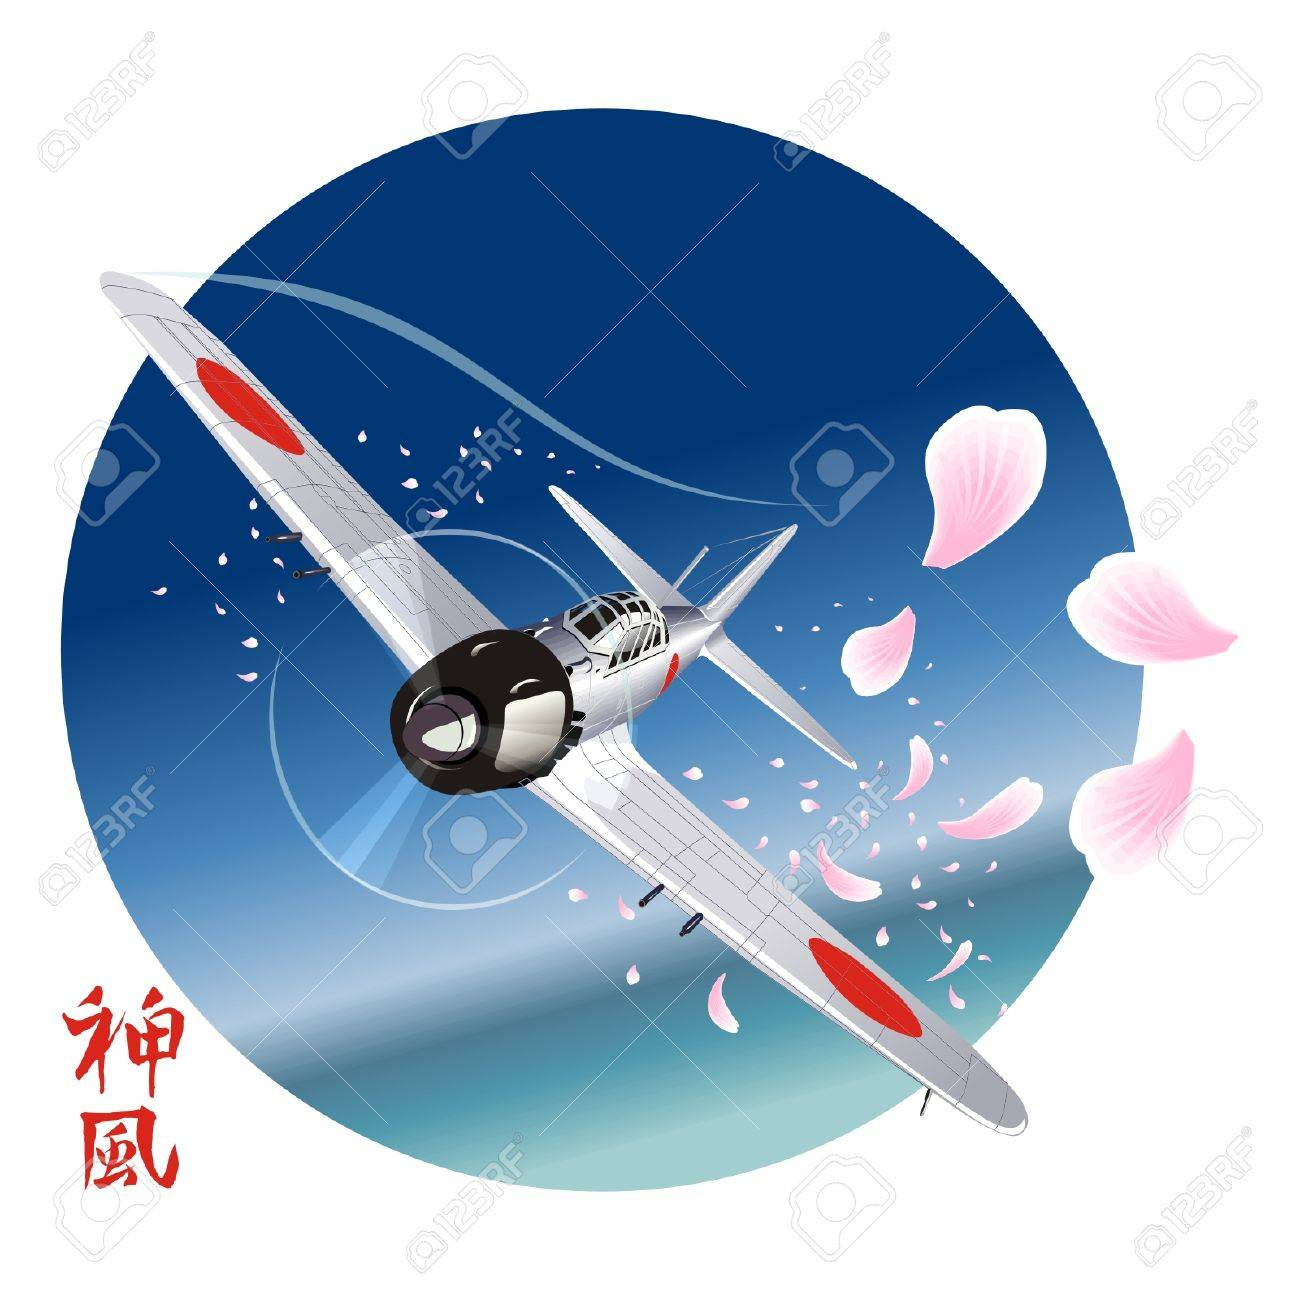 Retro japan fighter A6M